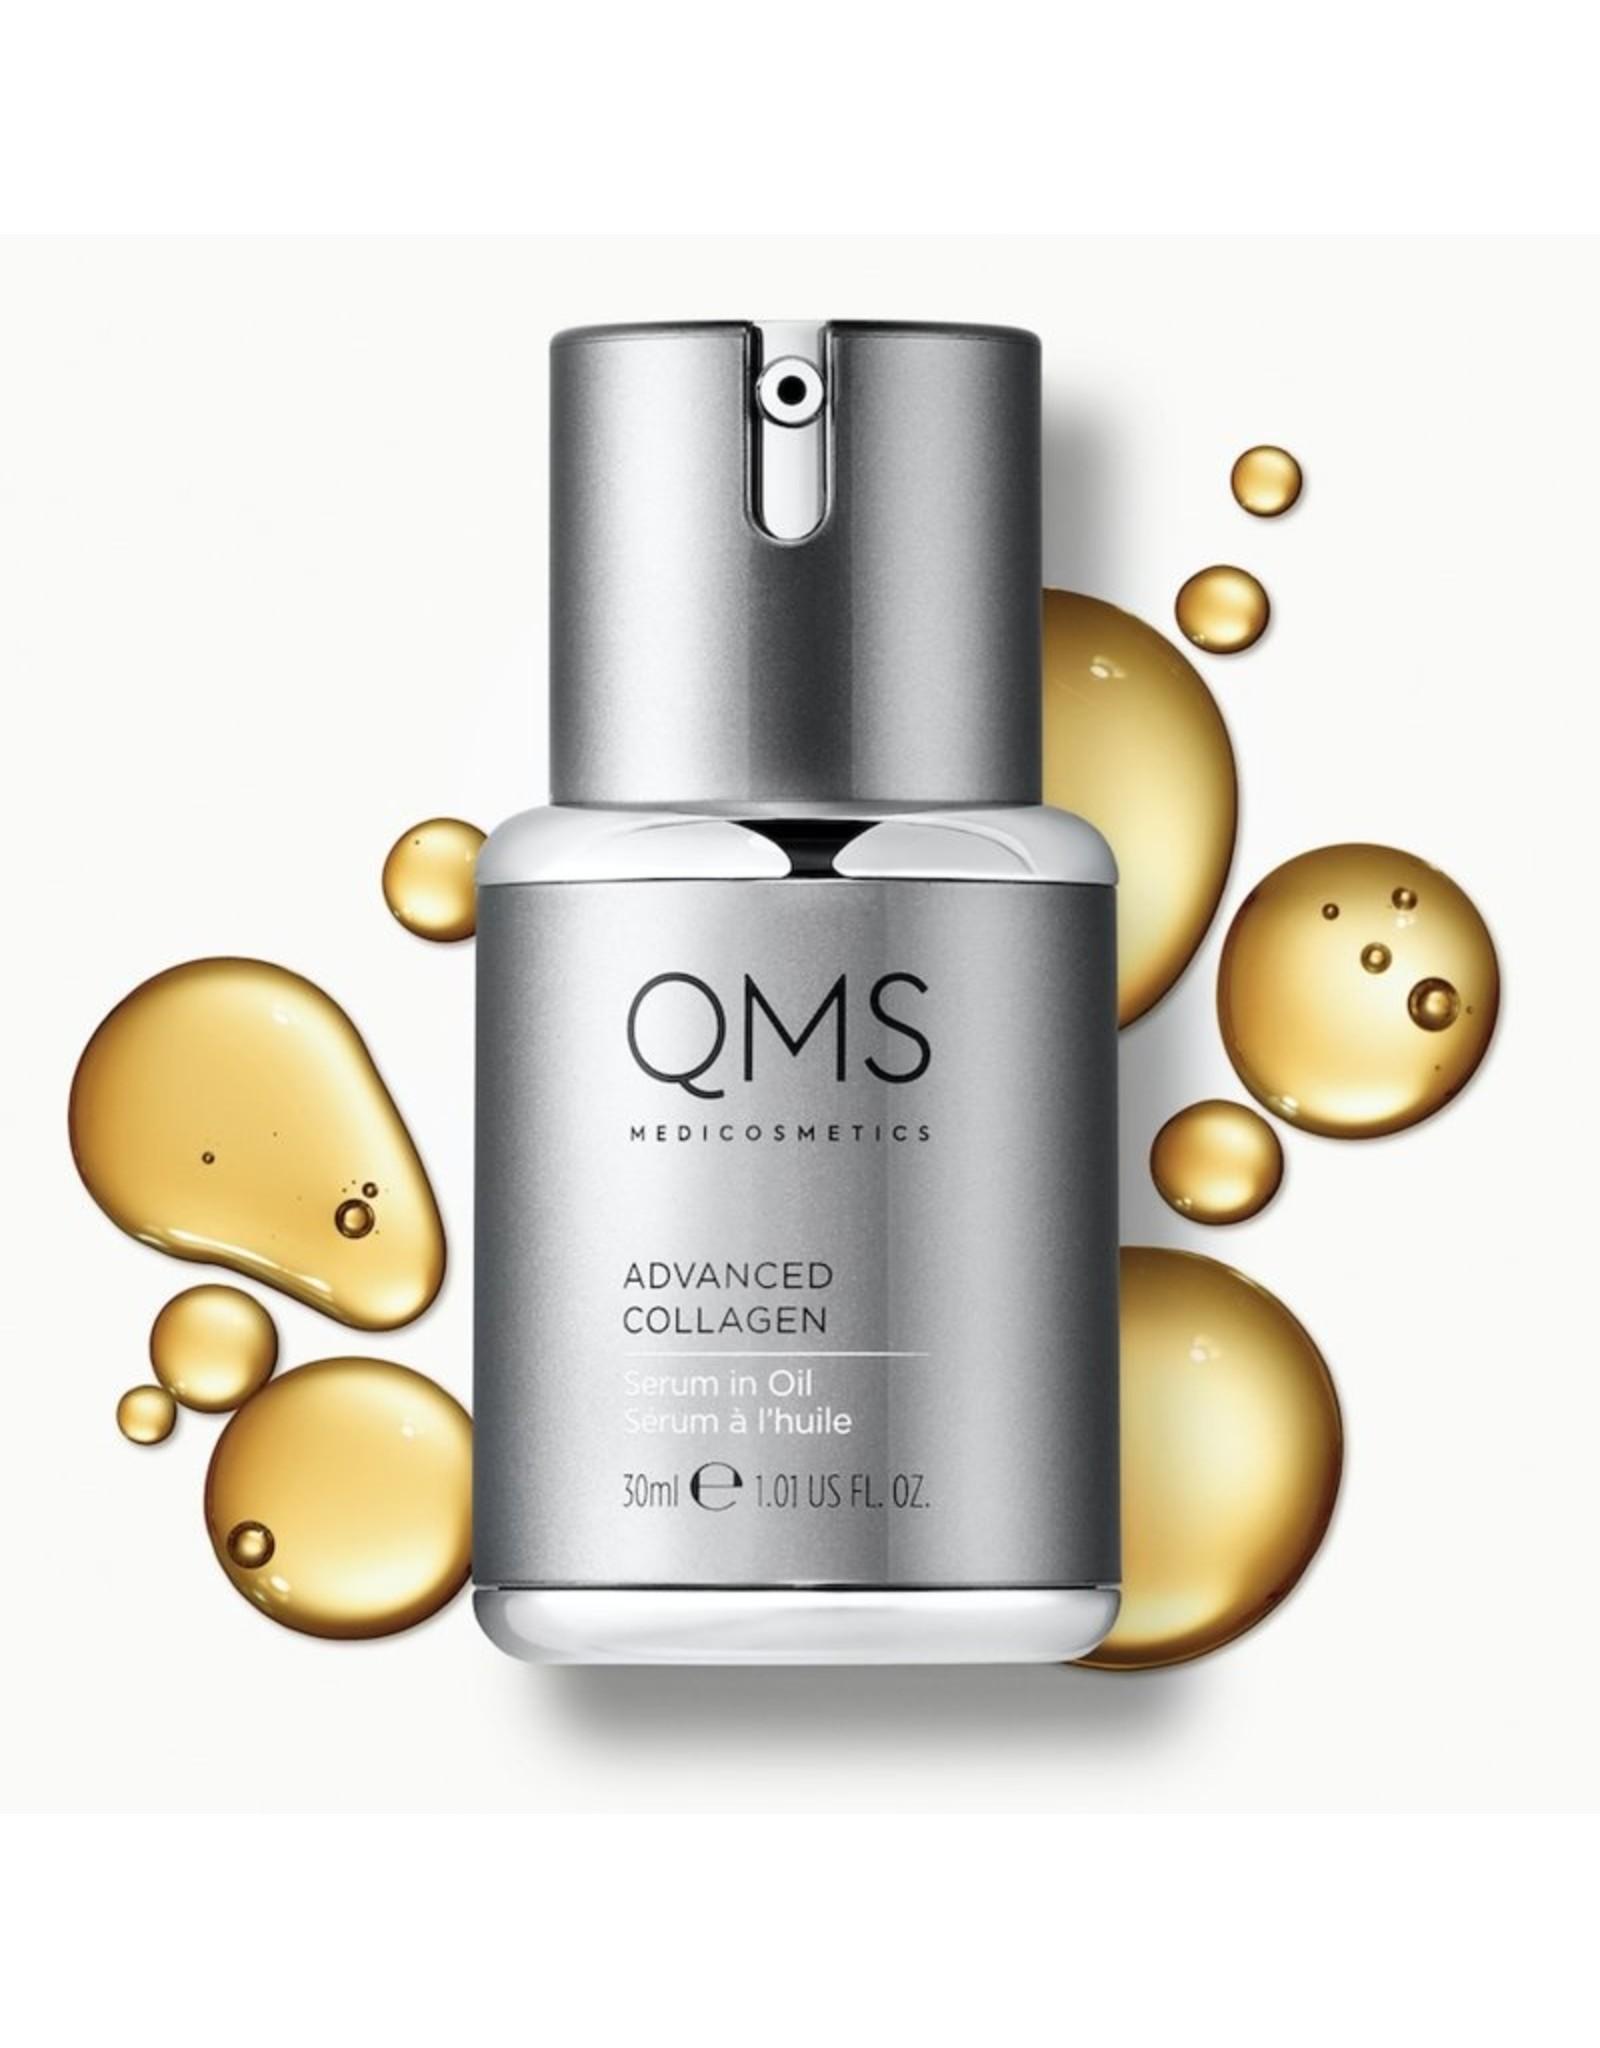 QMS Medicosmetics Advanced Collagen, 30ml